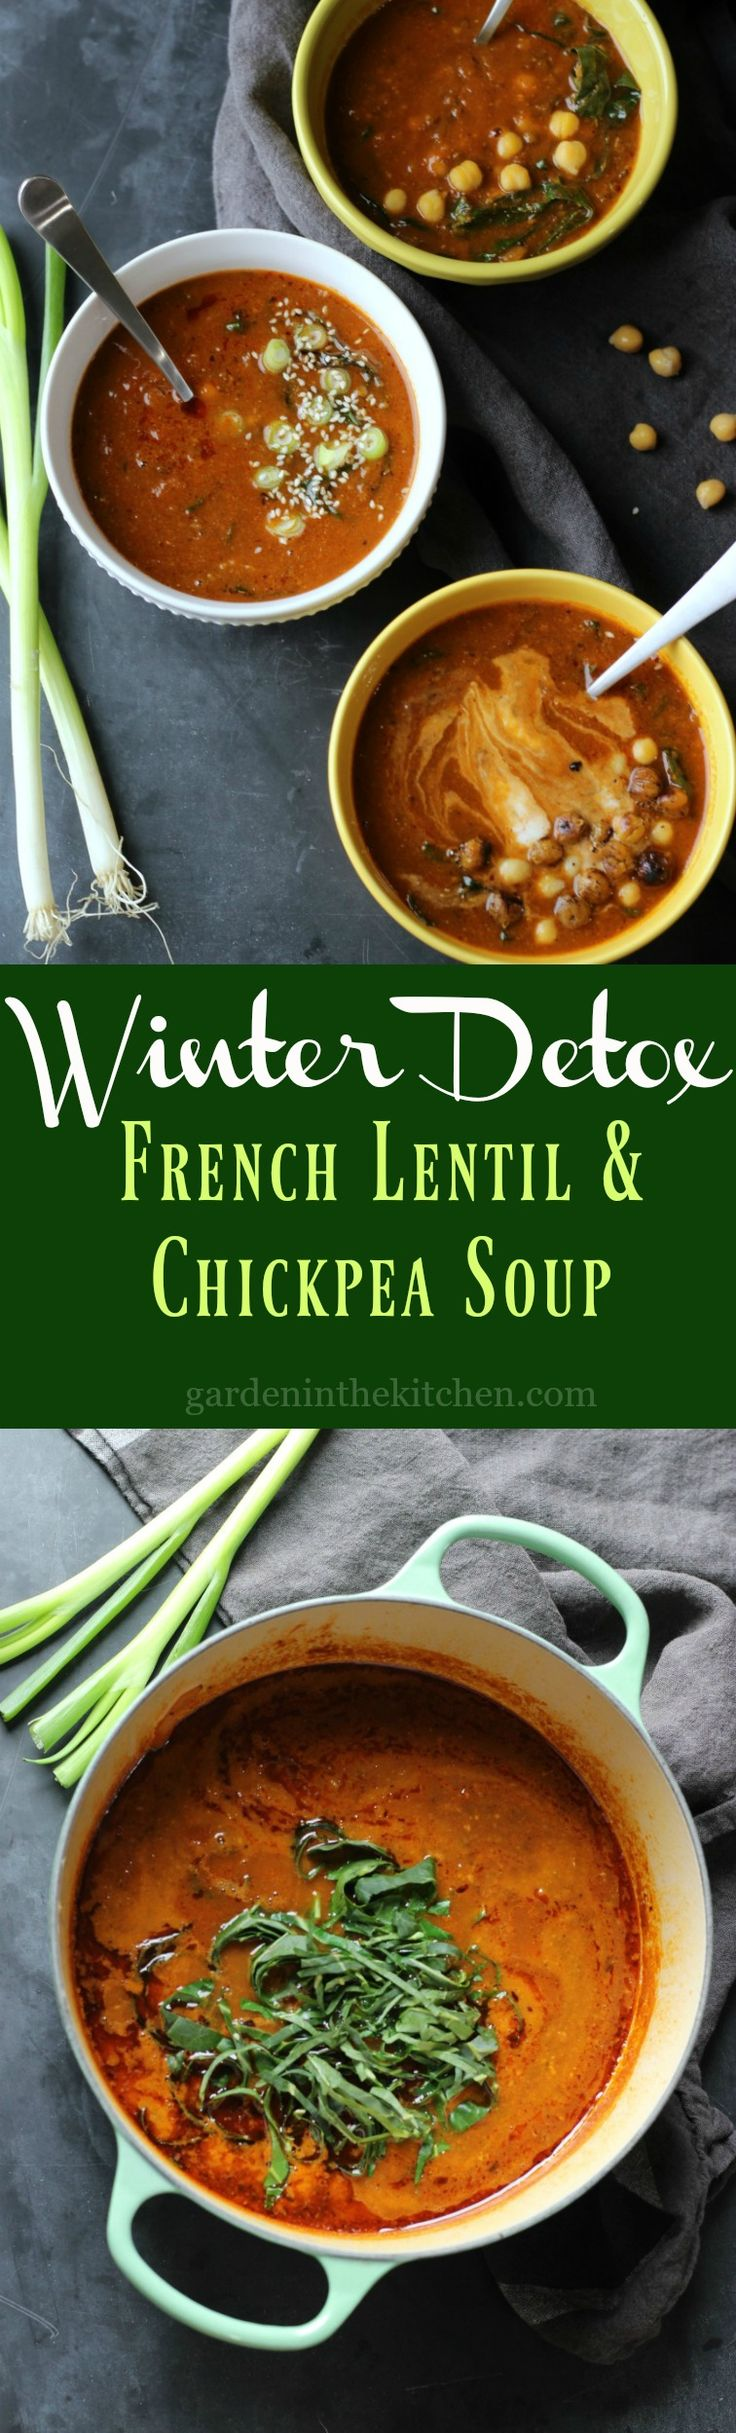 Winter Detox French Lentil & Chickpea Soup (Vegan) | gardeninthekitchen.com